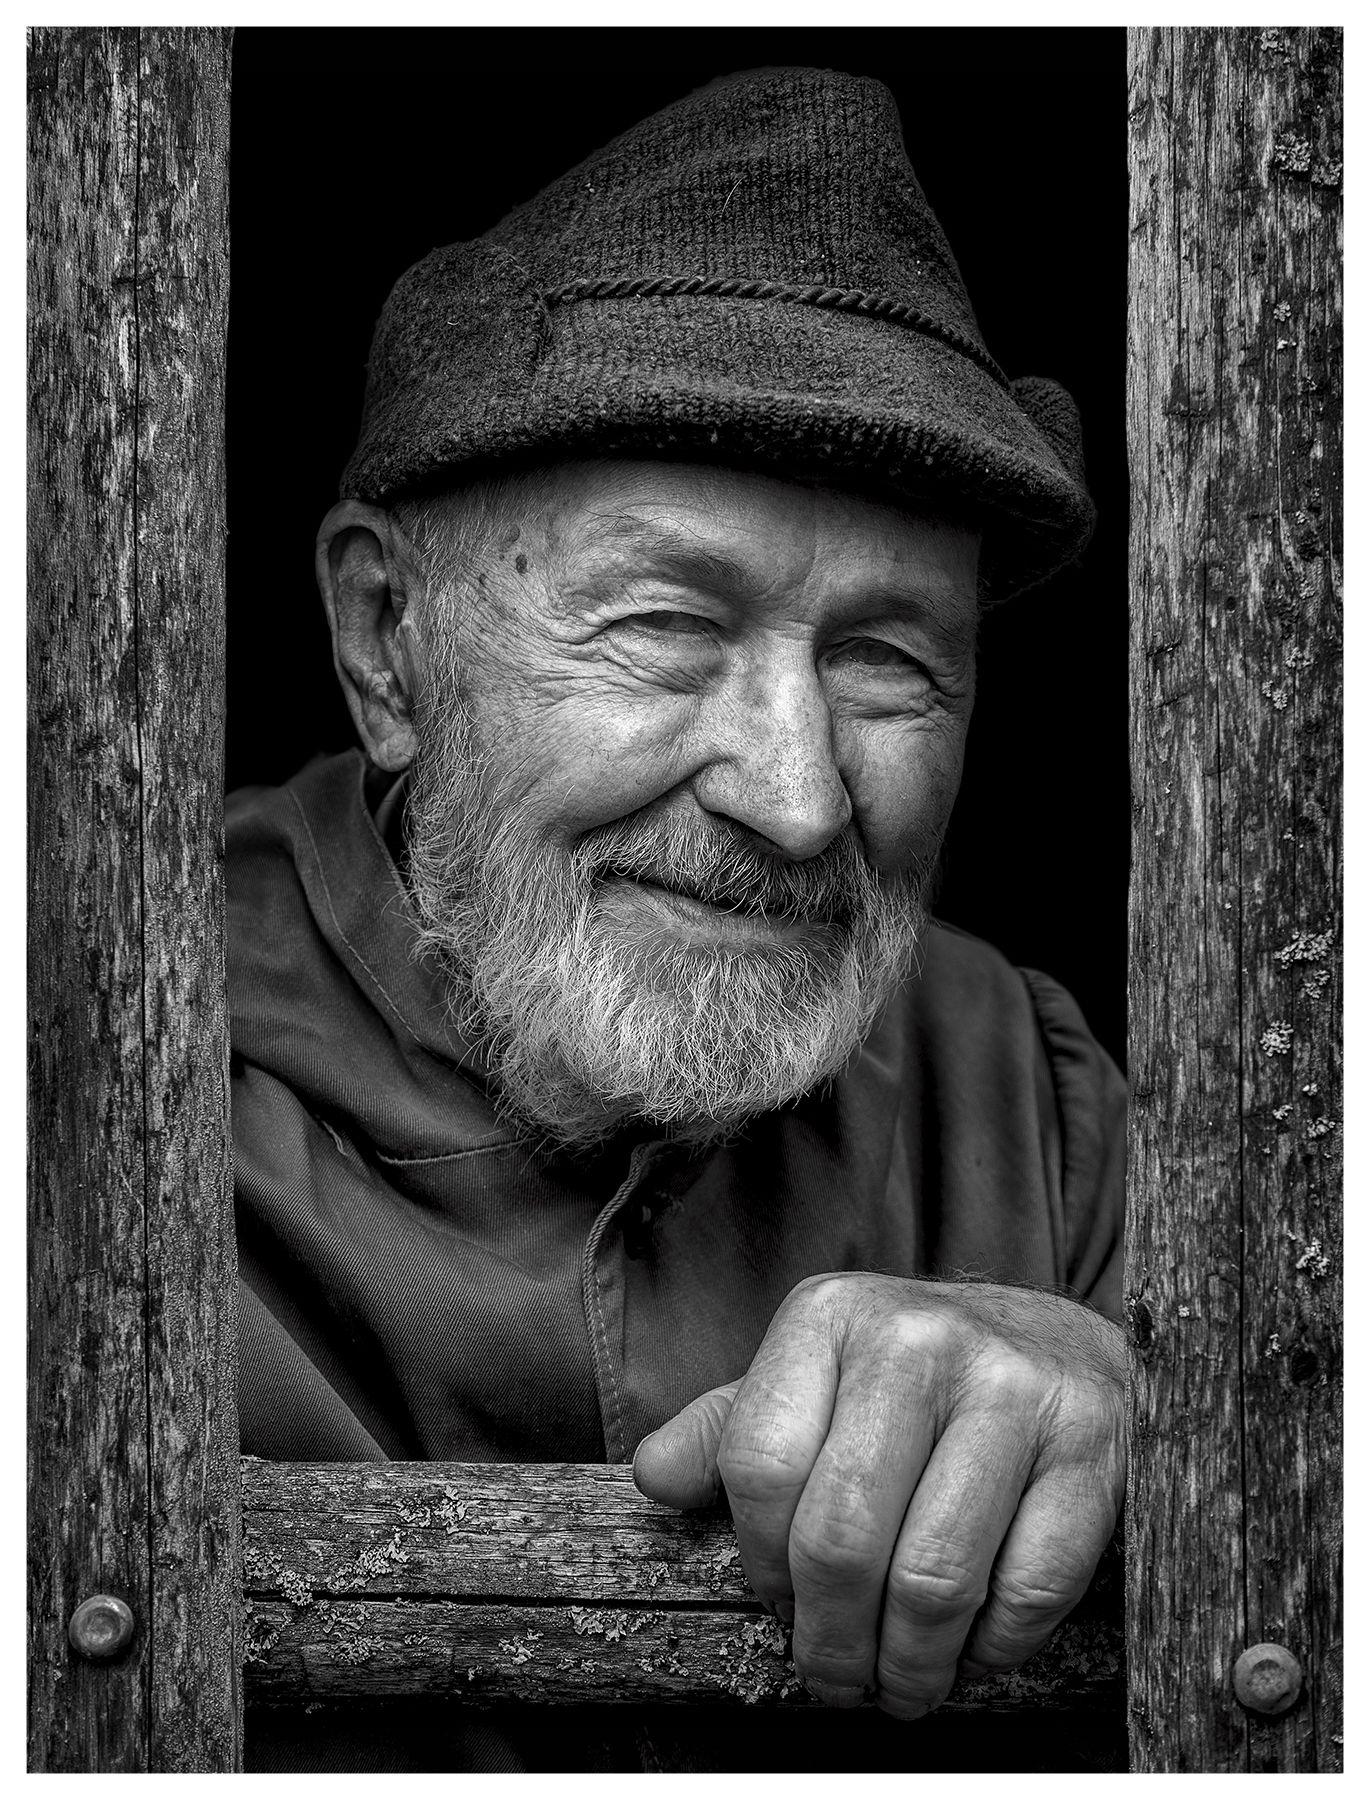 Дед Валя Valentin Pazhetnov model portrait grandfather ecologist bears look smile